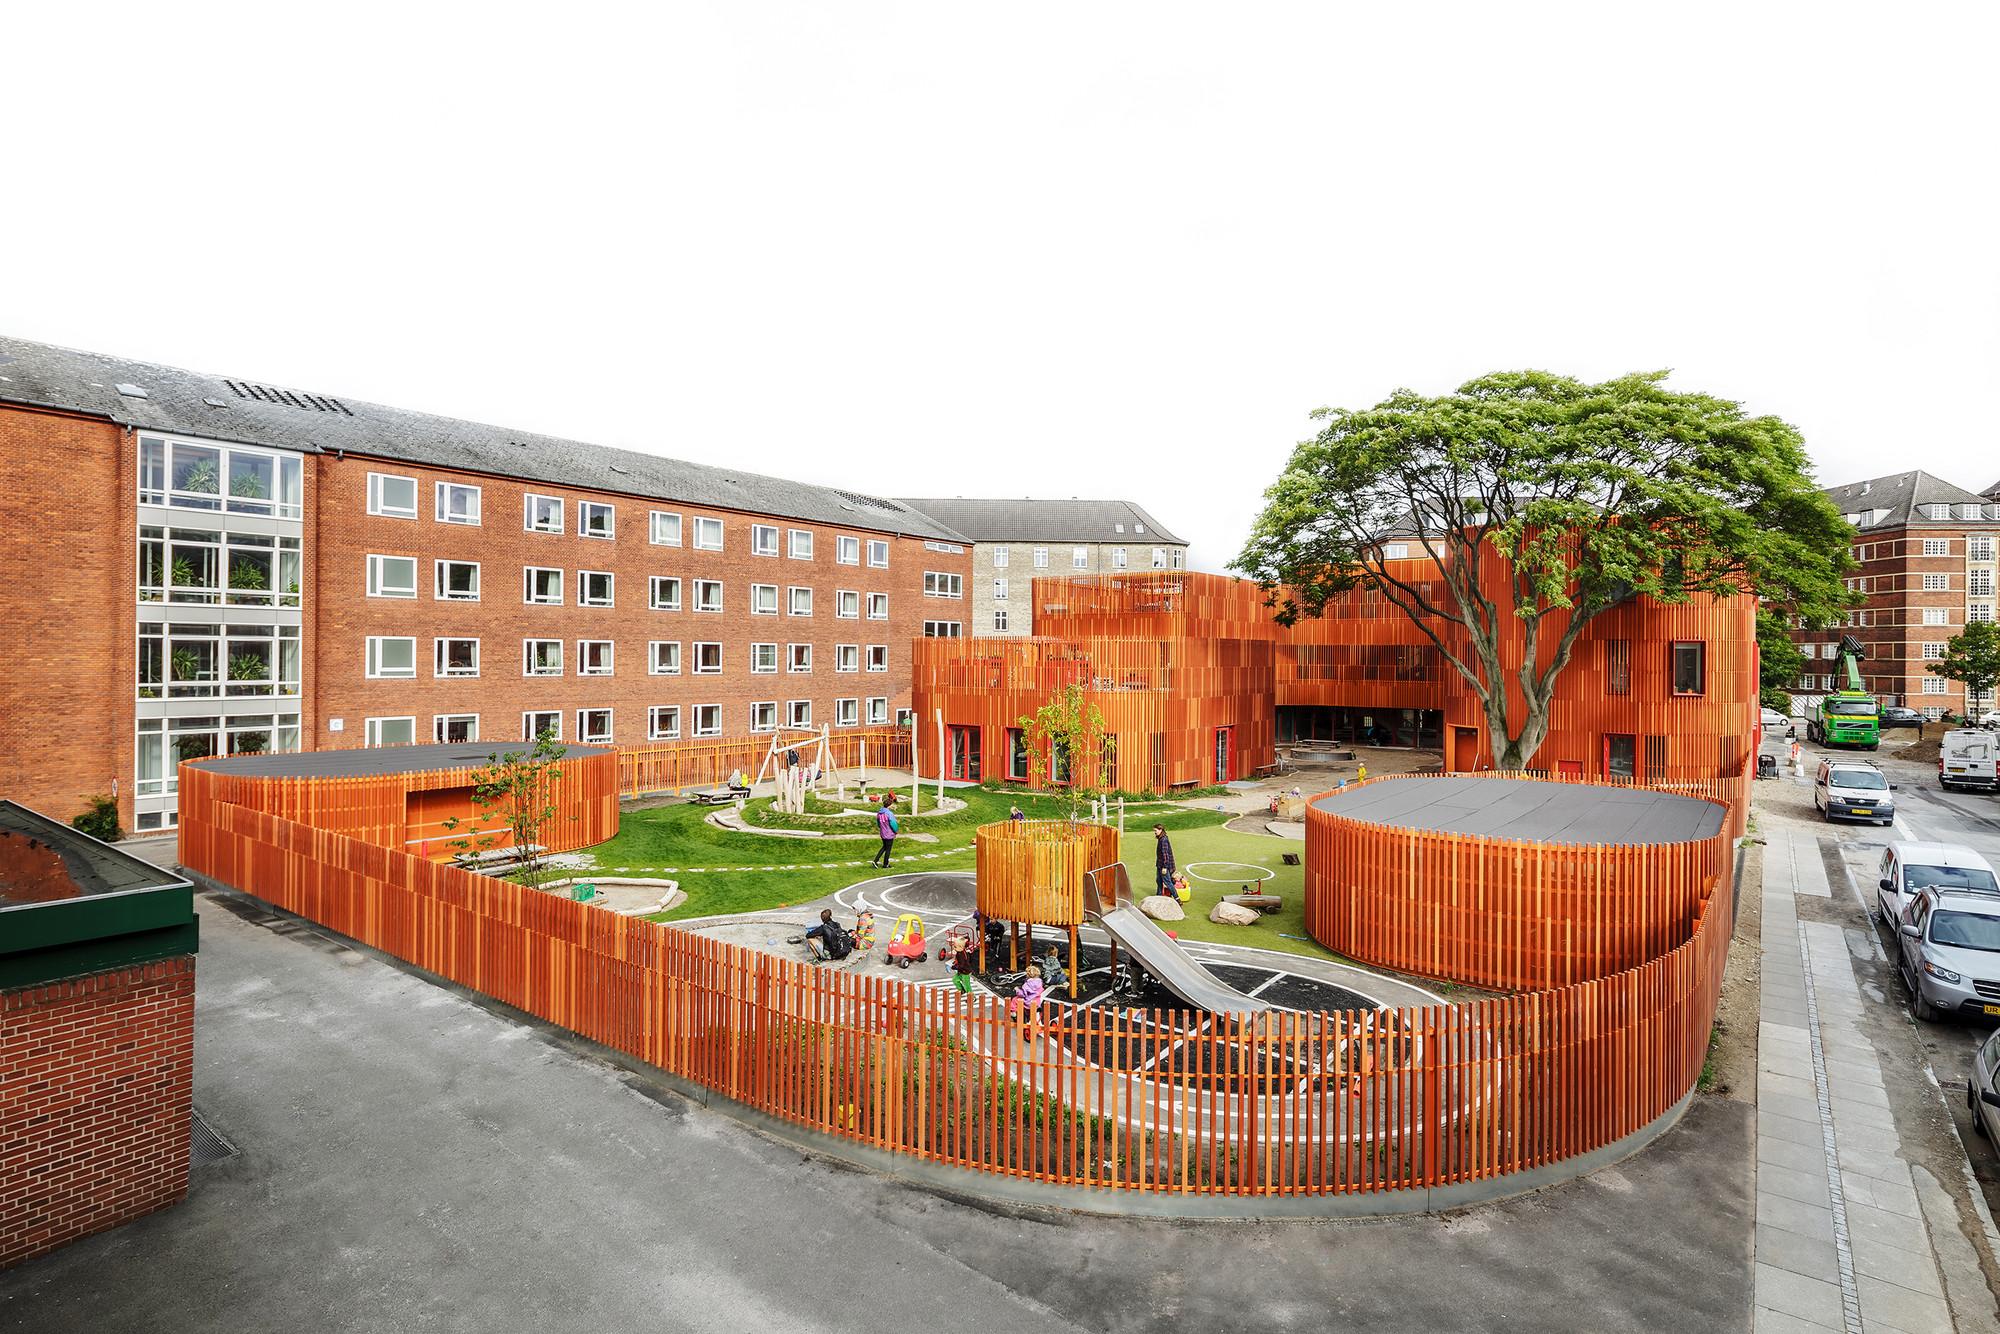 Forfatterhuset Kindergarten. Image © Rasmus Hjortshøj and Adam Mørk